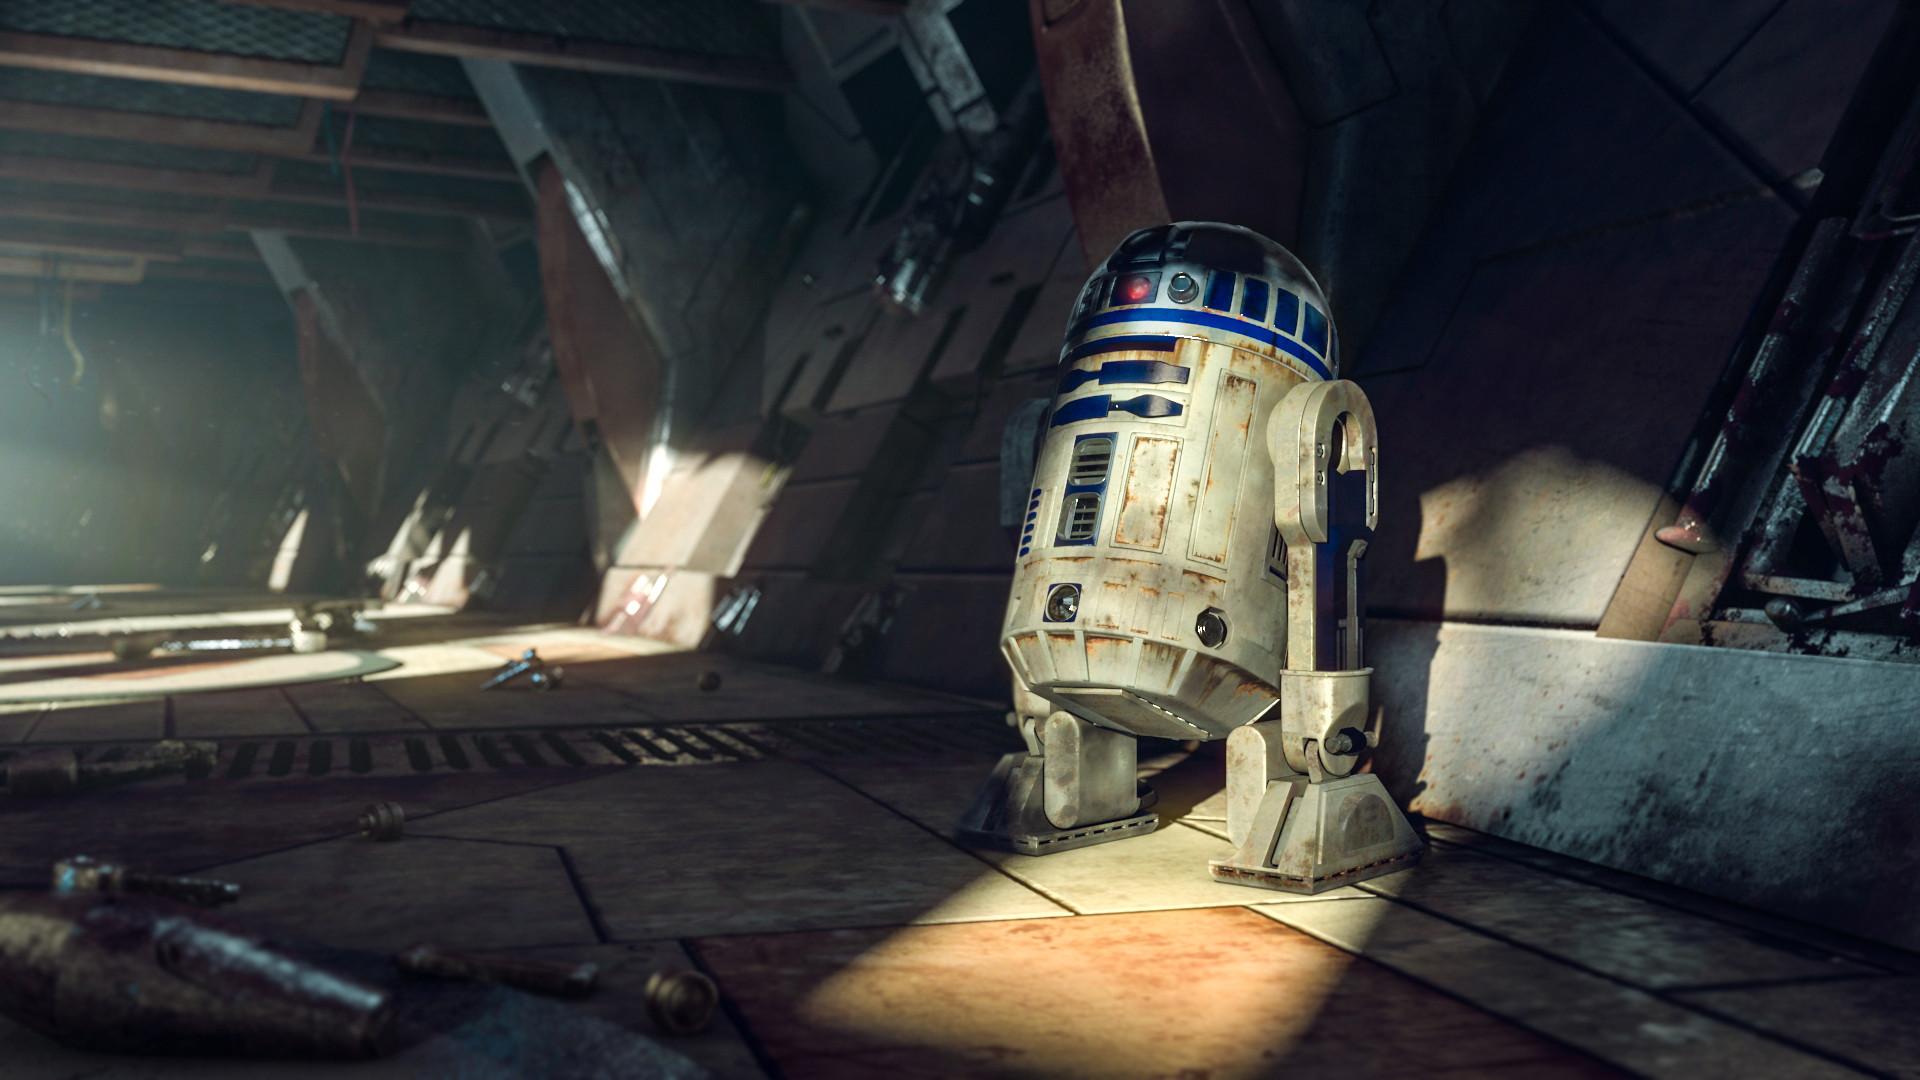 R2d2 Wallpaper Star Wars Hd Wallpaper R2d2, Download